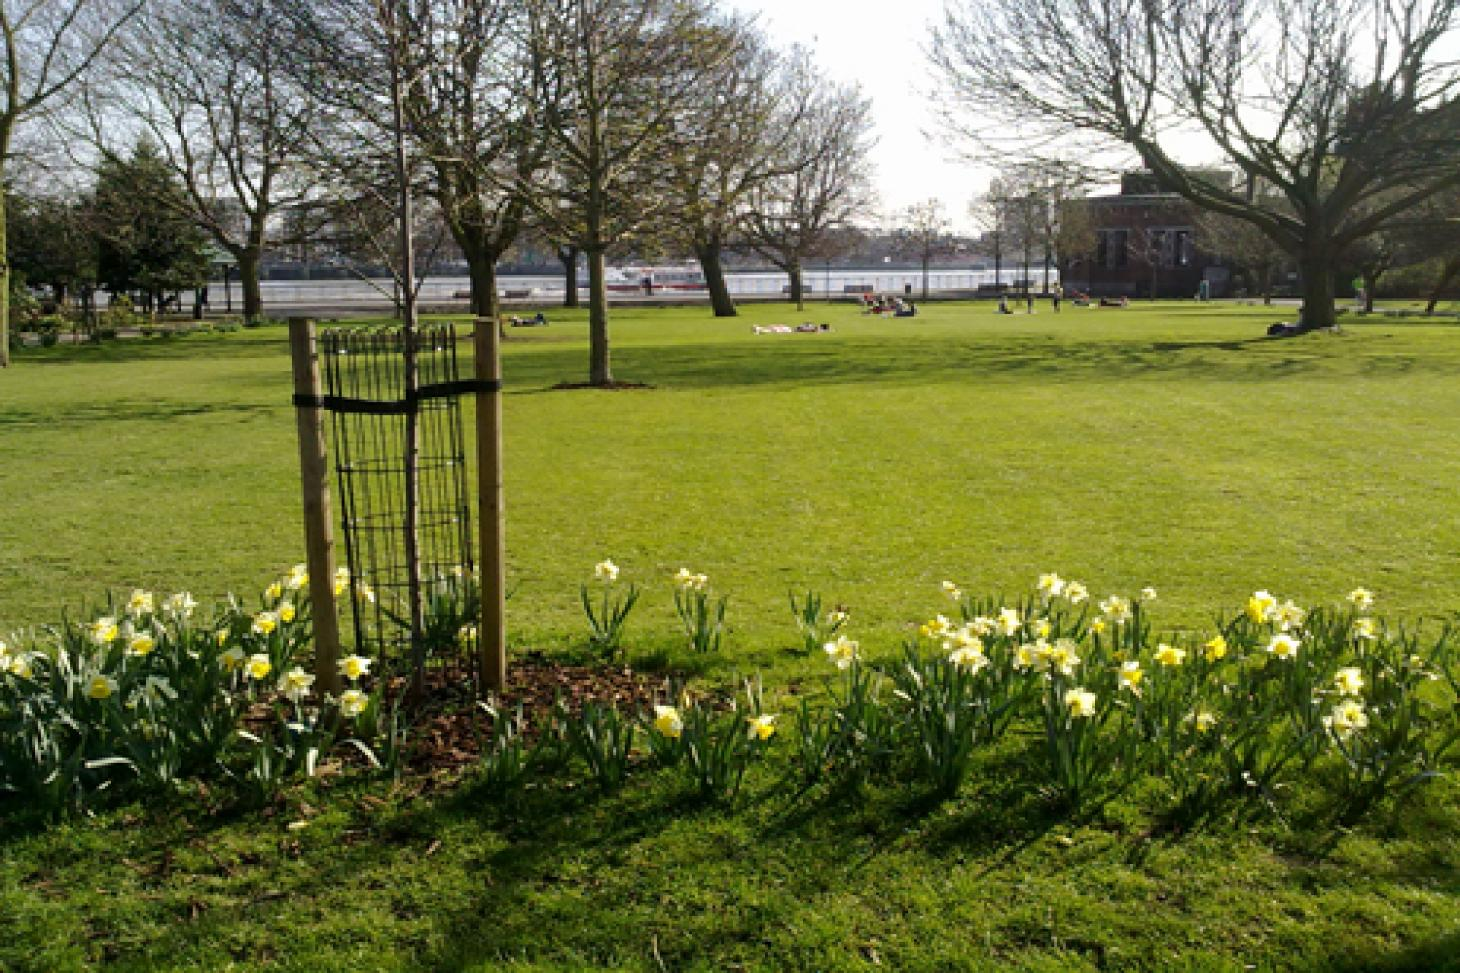 King Edward Memorial Park 11 a side | Concrete football pitch